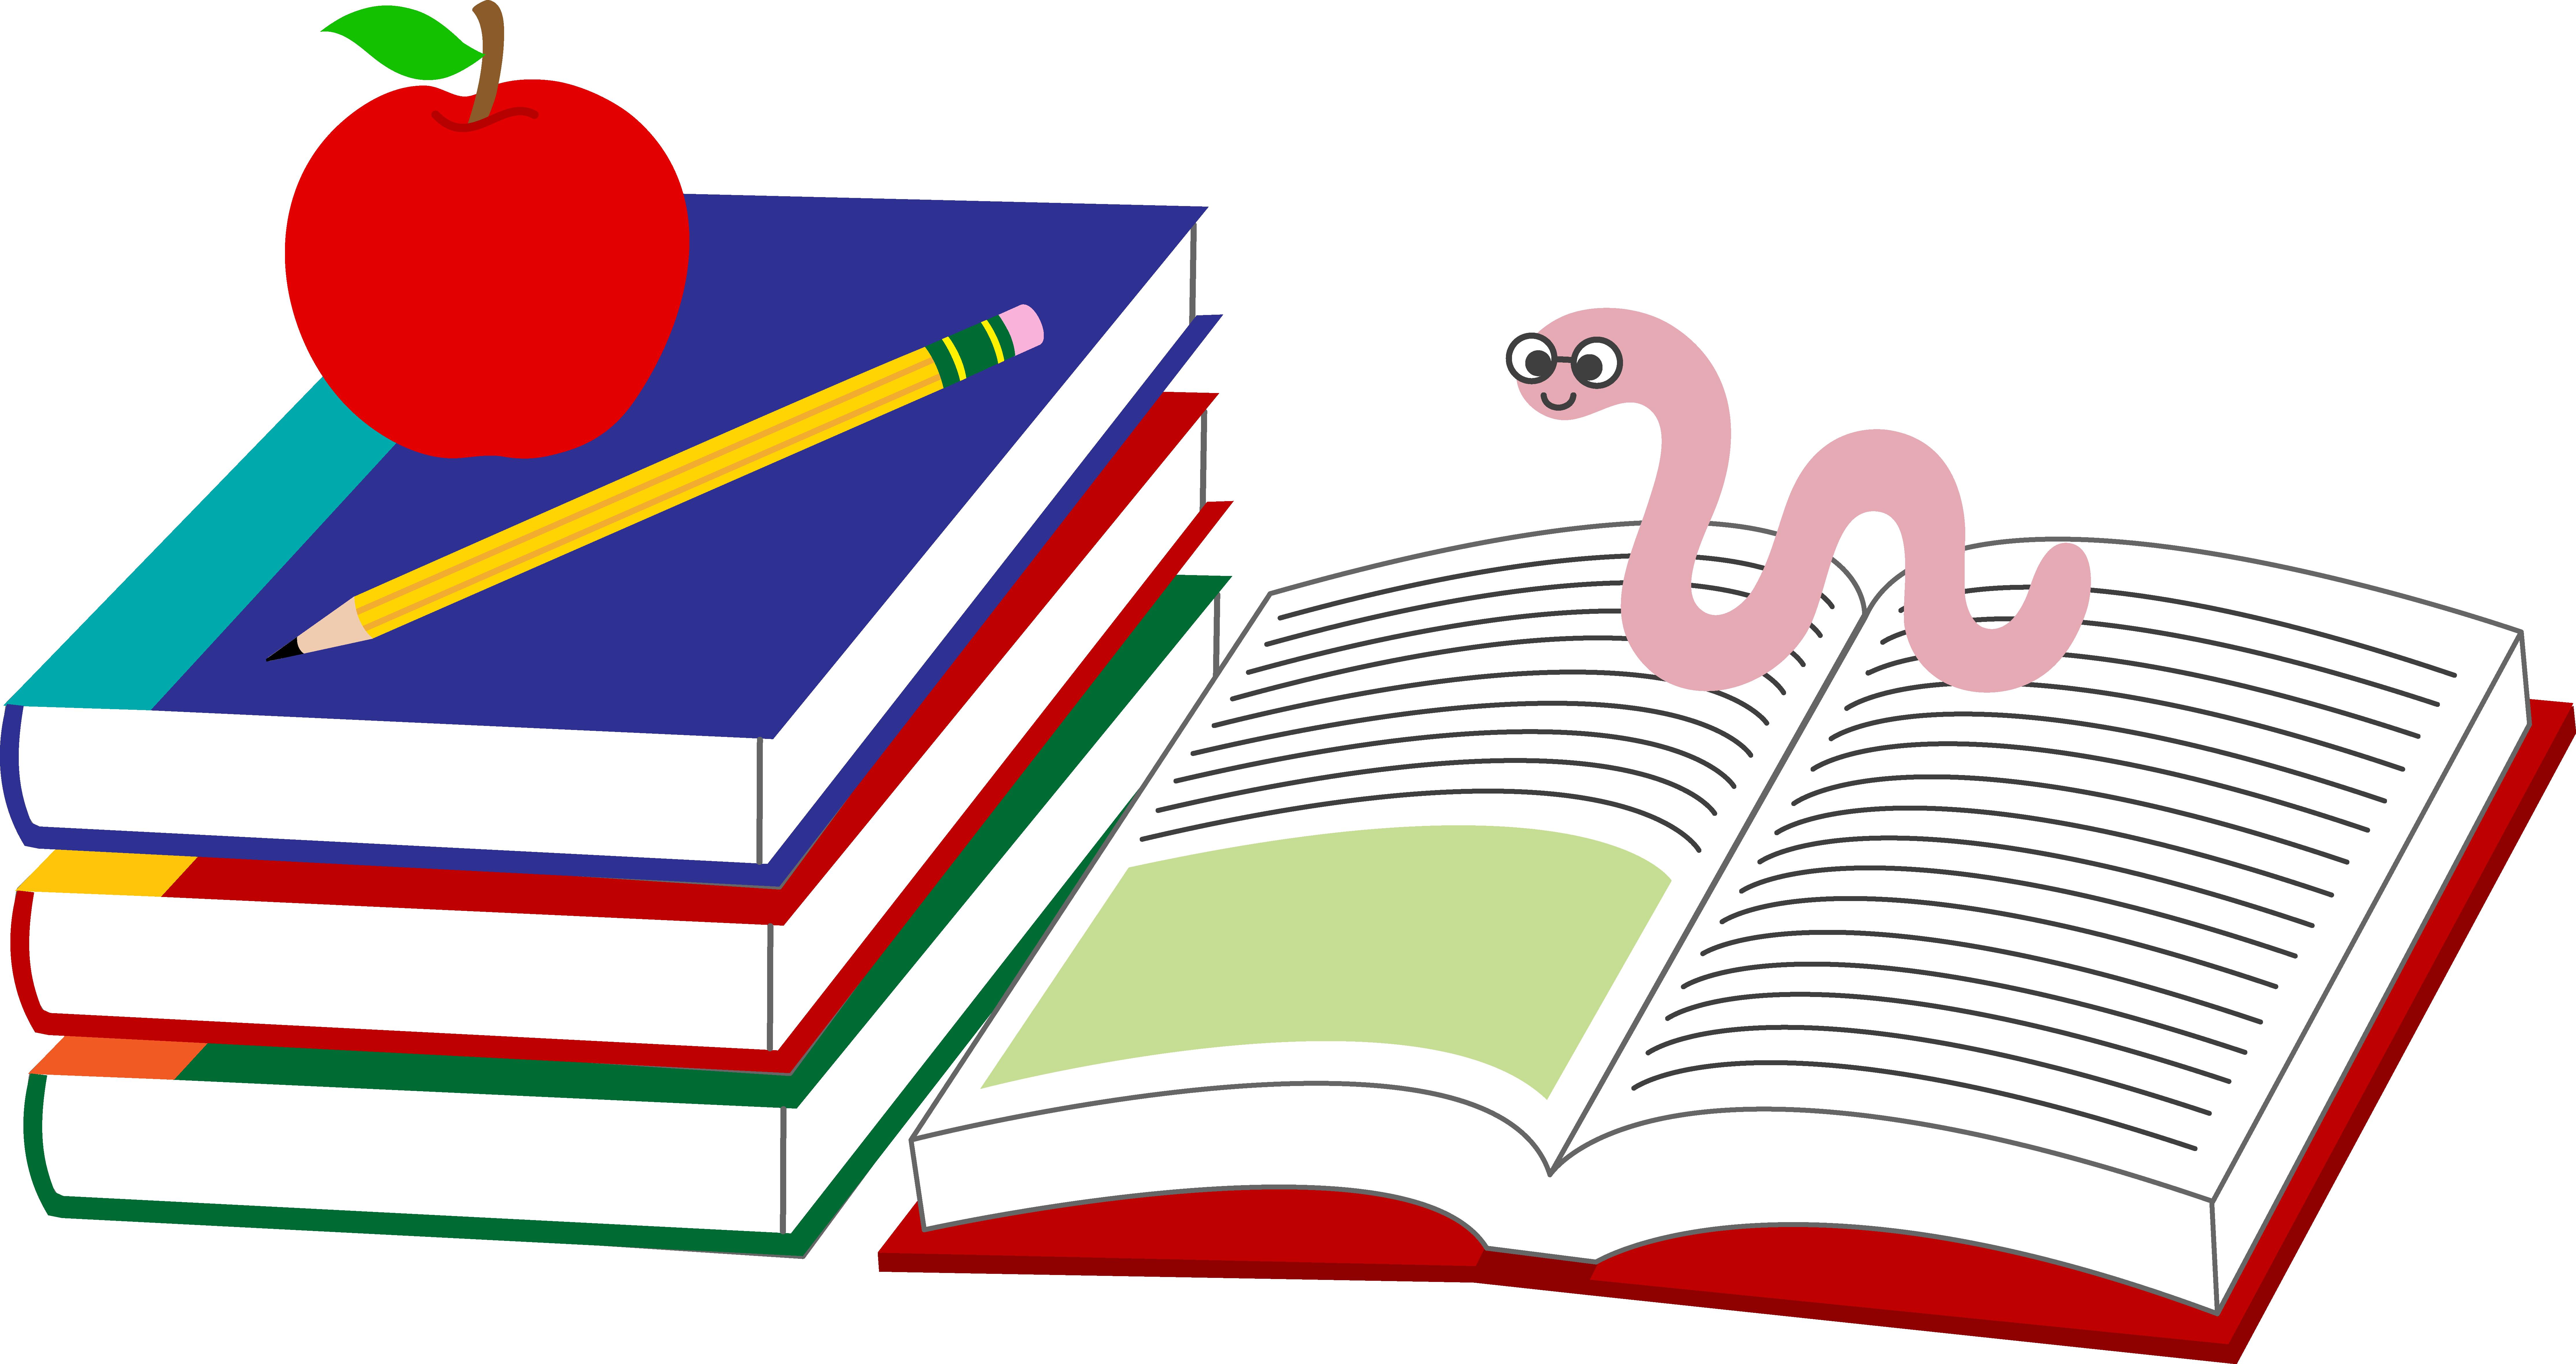 Covered clipart school book Books School Art Worm School